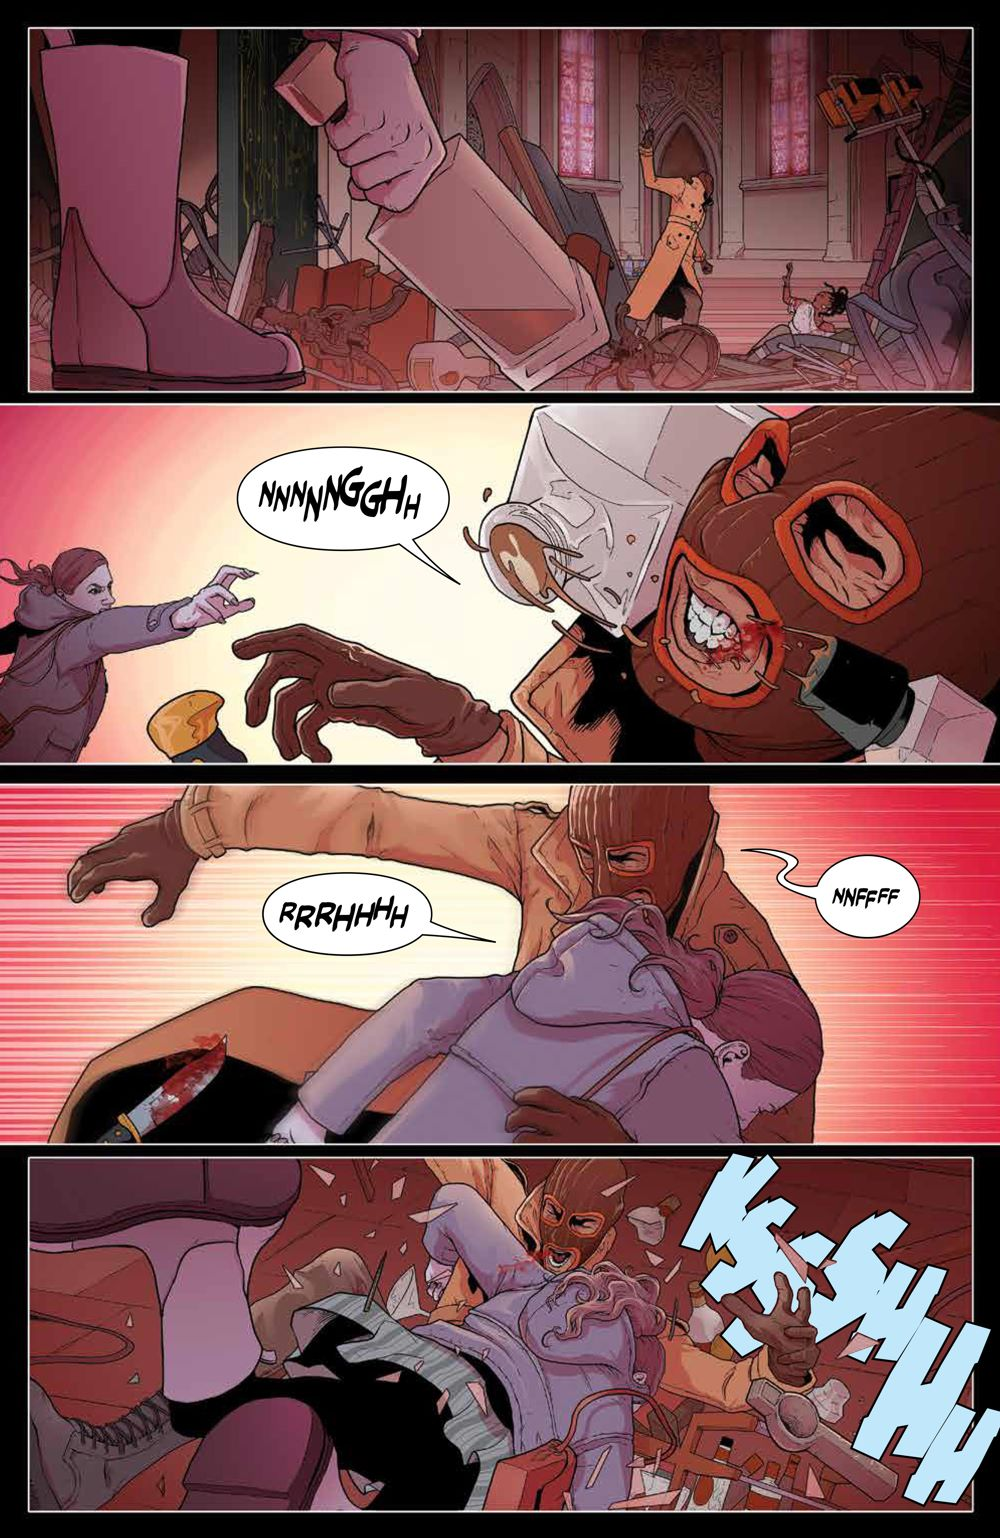 RedMother_v3_SC_PRESS_12 ComicList Previews: RED MOTHER VOLUME 3 TP